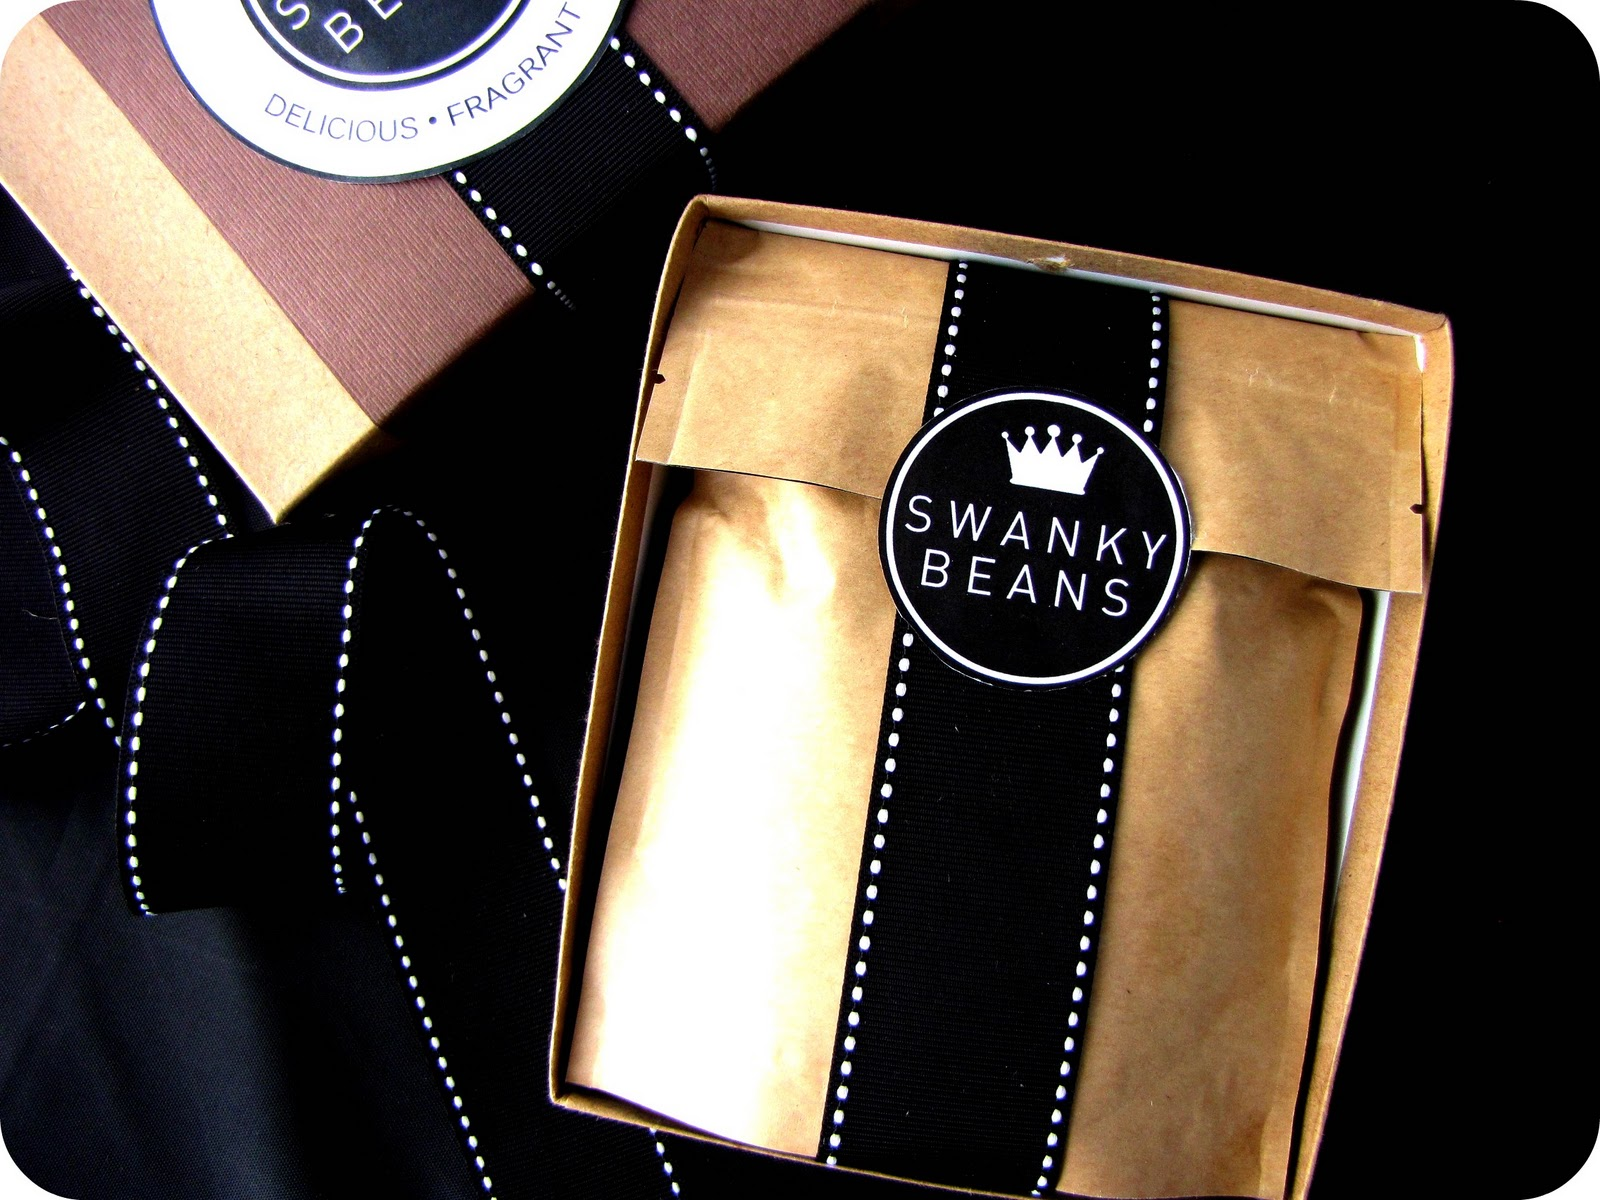 Surya Mas Jaya Kopi Luwak Packaging Lembah Cimanong 250 Gram By My House Of Giggles Swanky Beansthe Best Coffee In The World